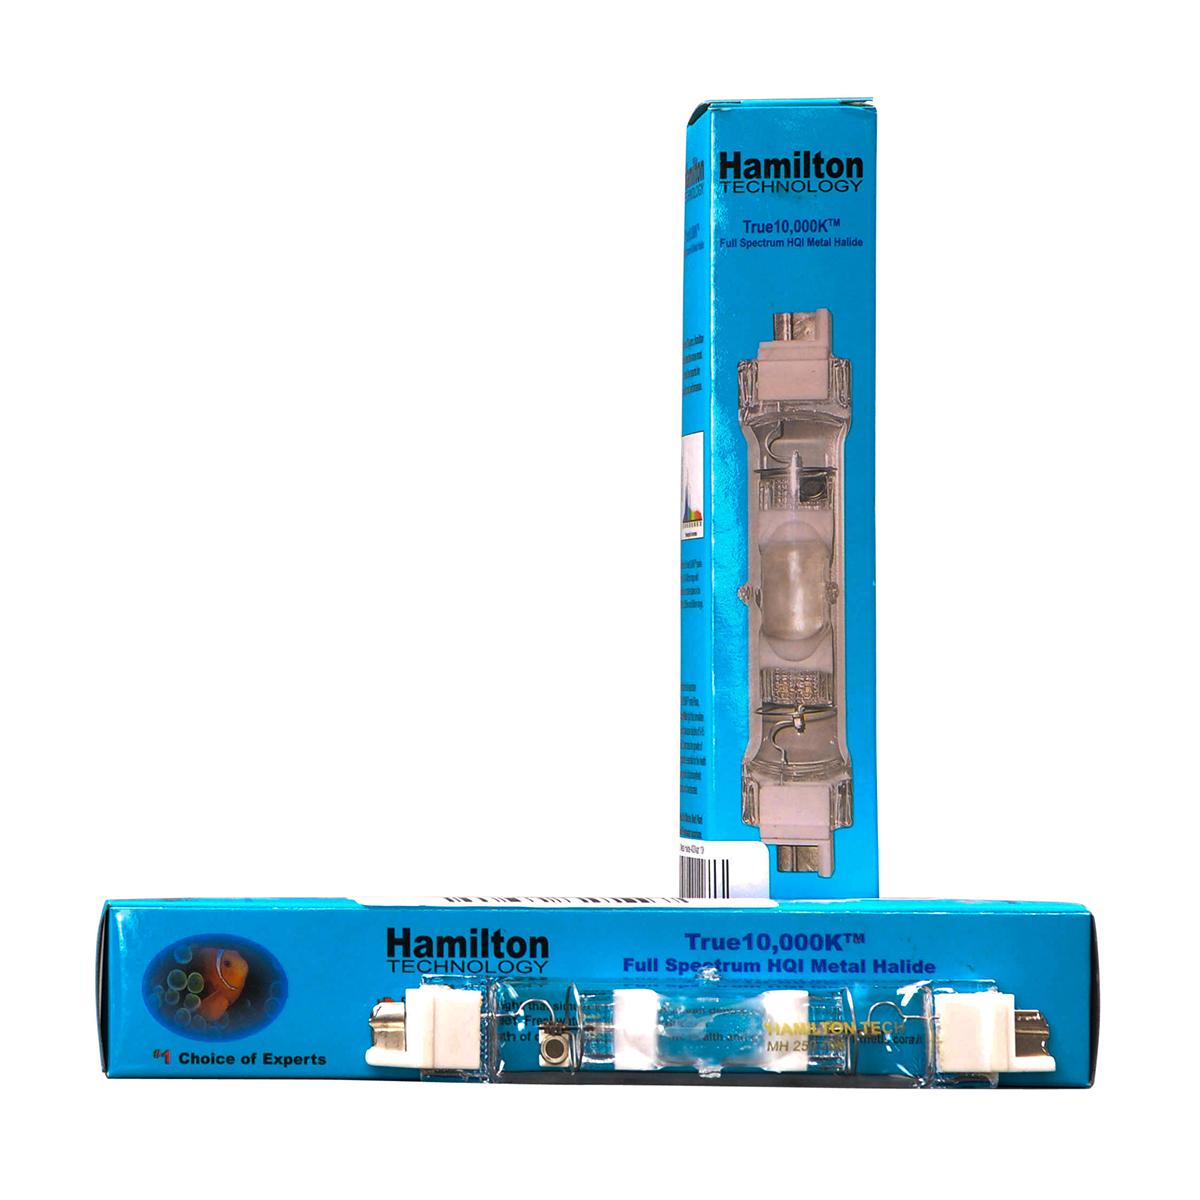 Hamilton Technology Bimini Sun 250w Metal Halide System: Metal Halide 10K Double End Bulb